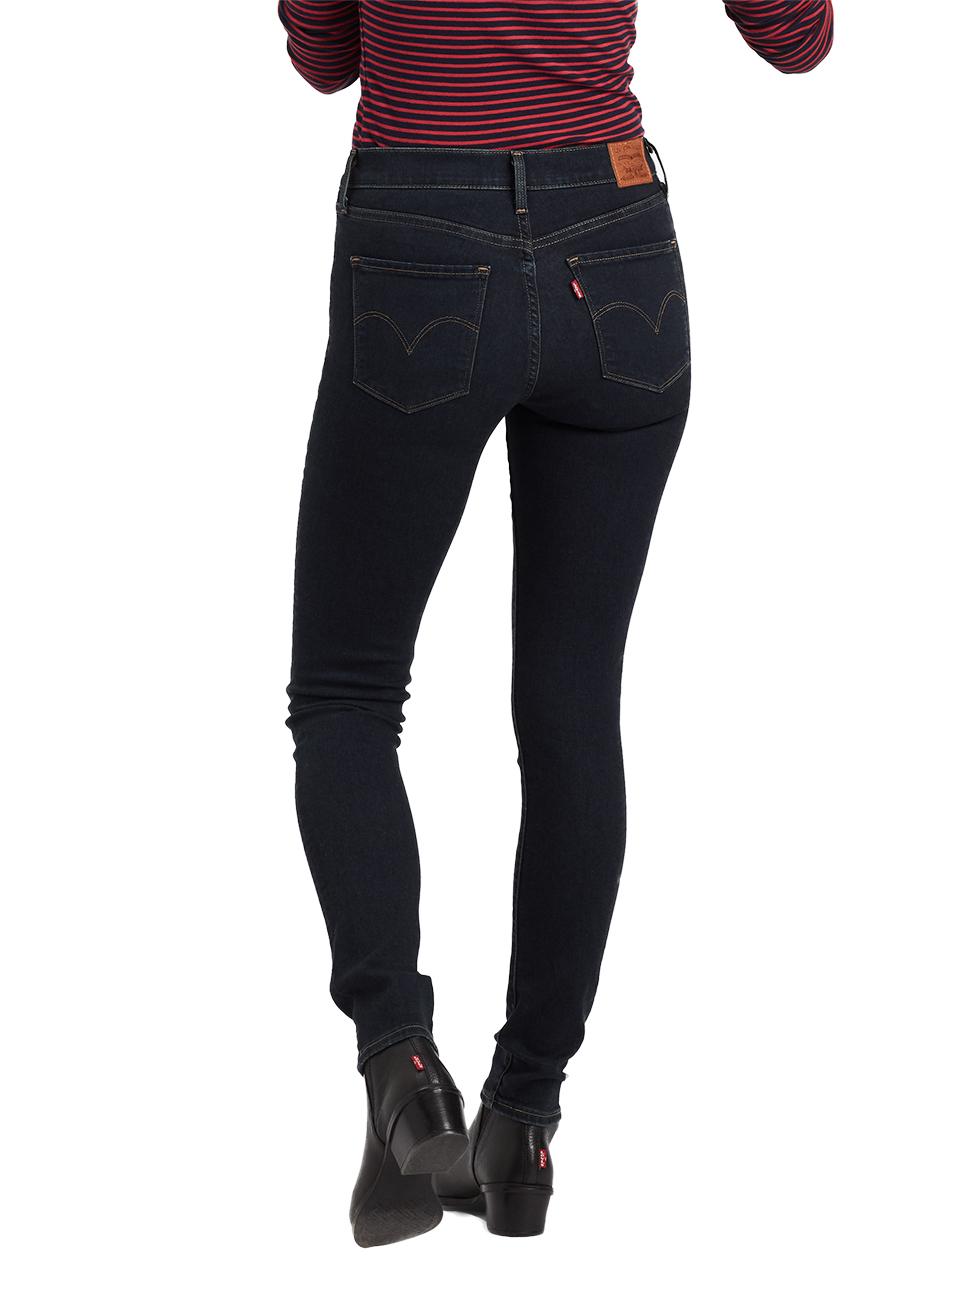 levis-damen-jeans-311-shaping-skinny-fit-blau-london-nights